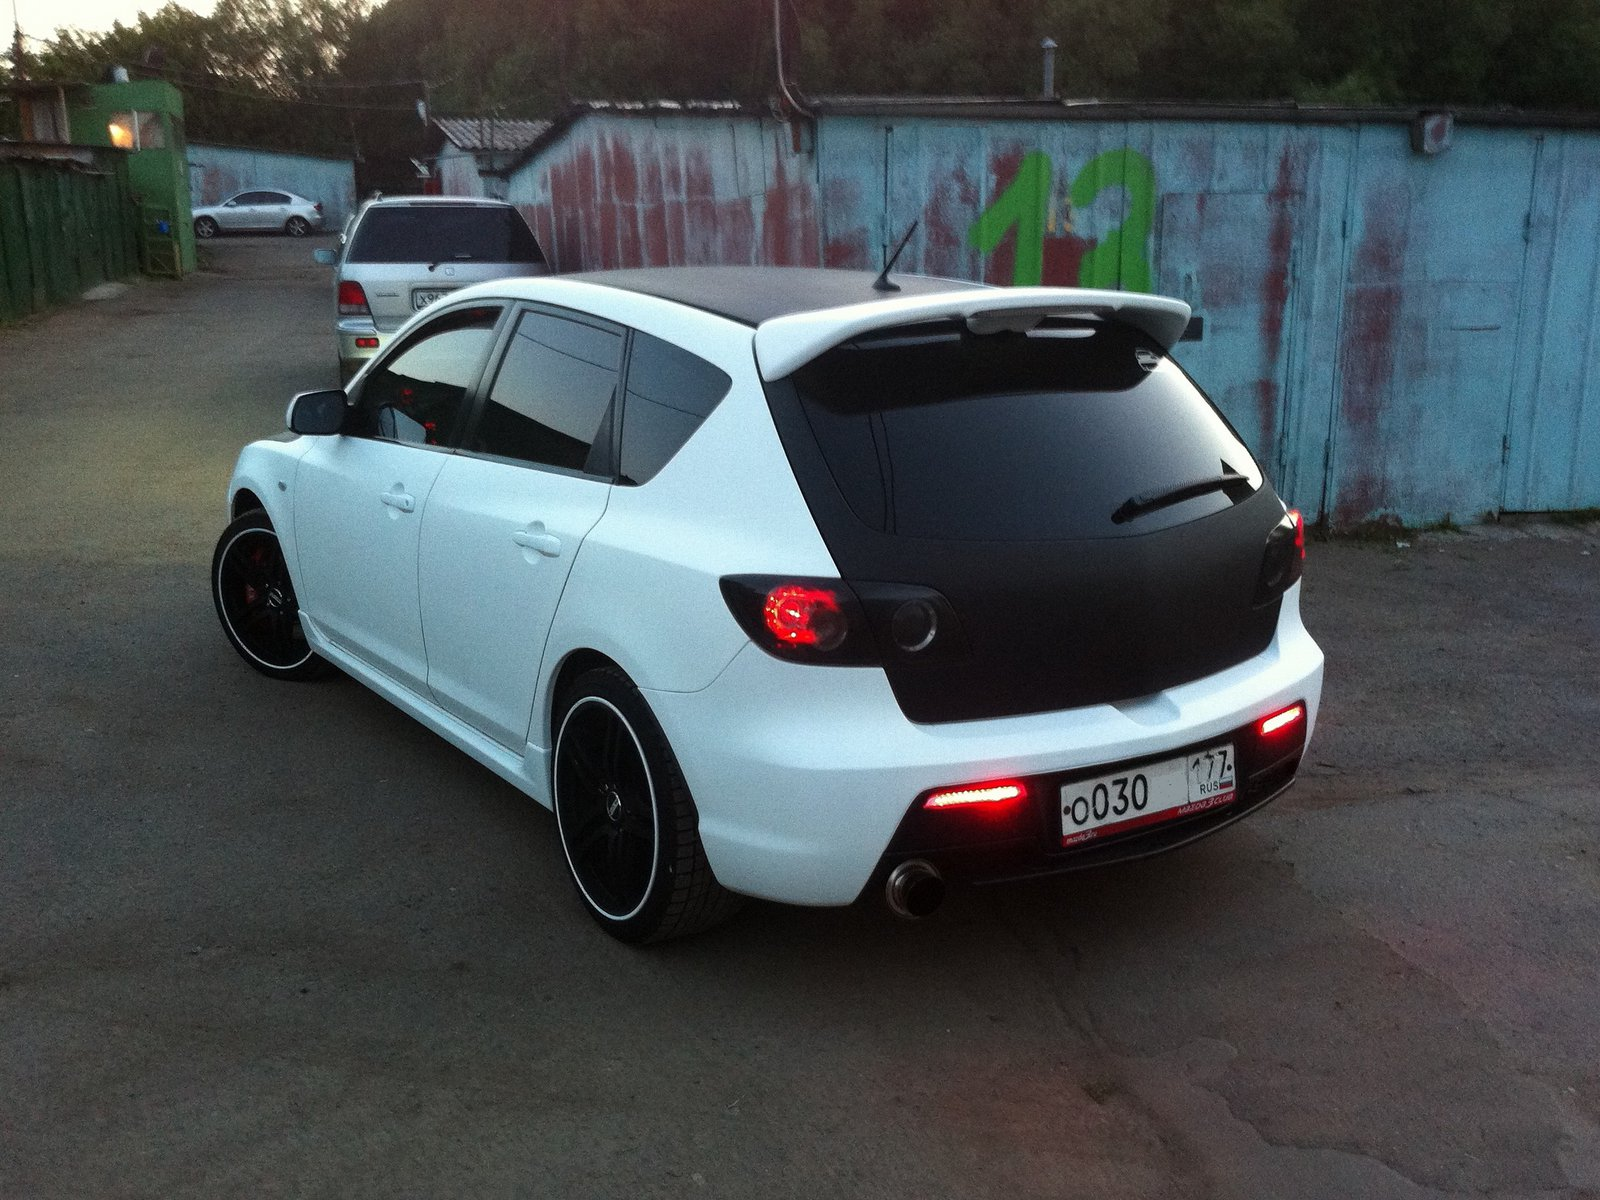 Продажа мопедов - auto sale :: Autotestcoua